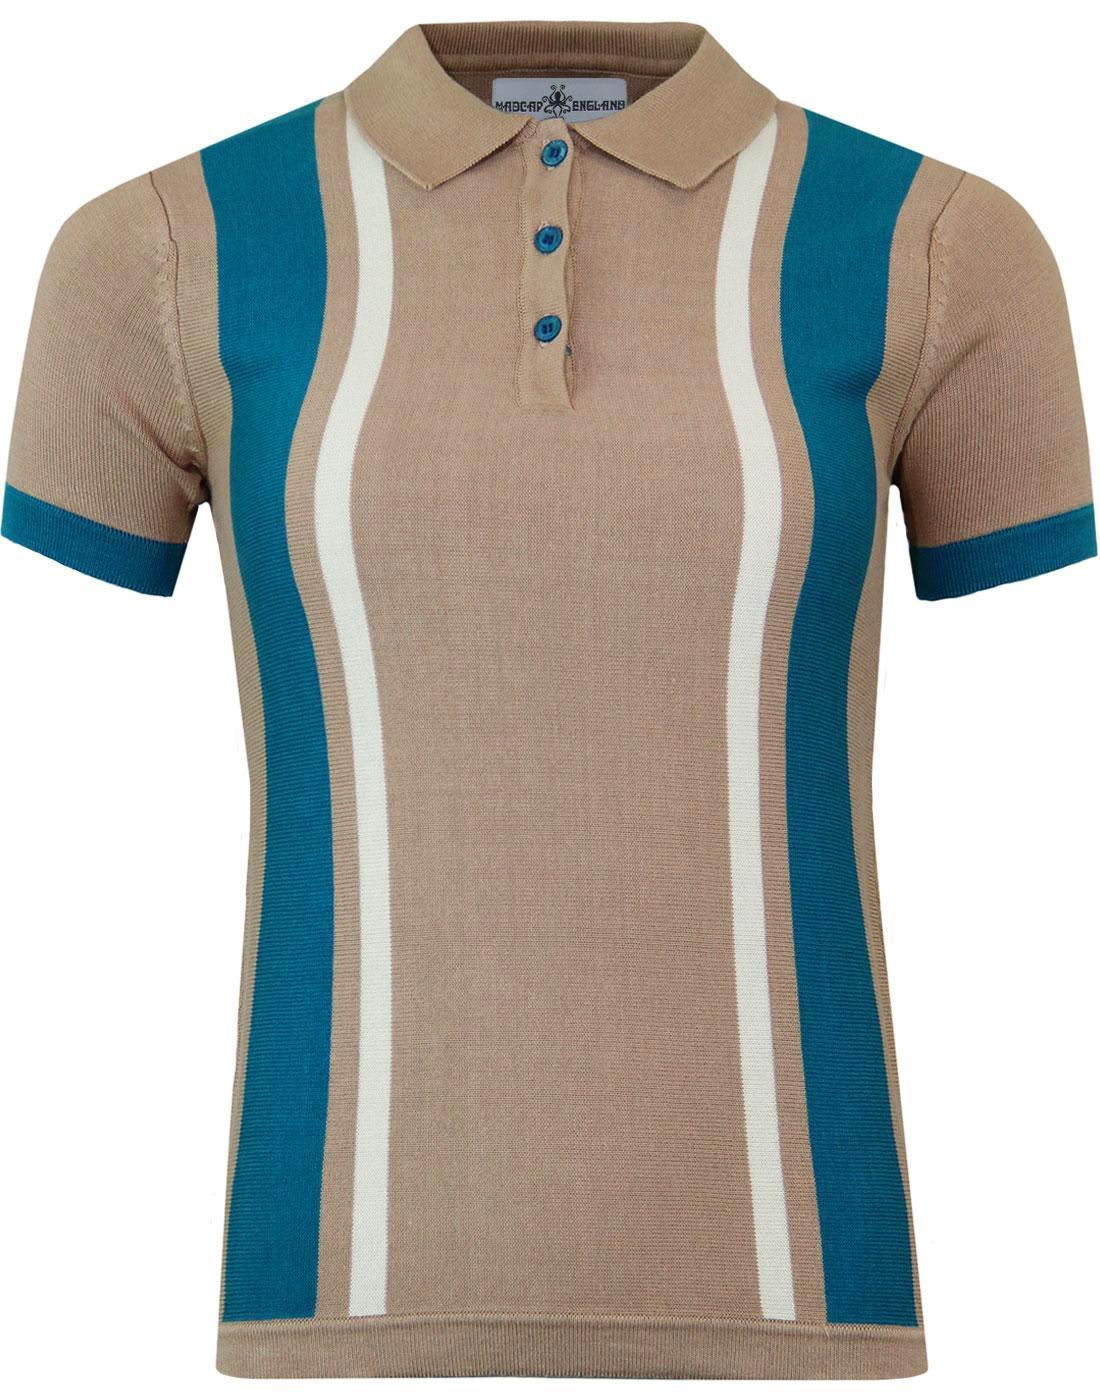 Fontella MADCAP ENGLAND 60s Mod Stripe Knit Polo